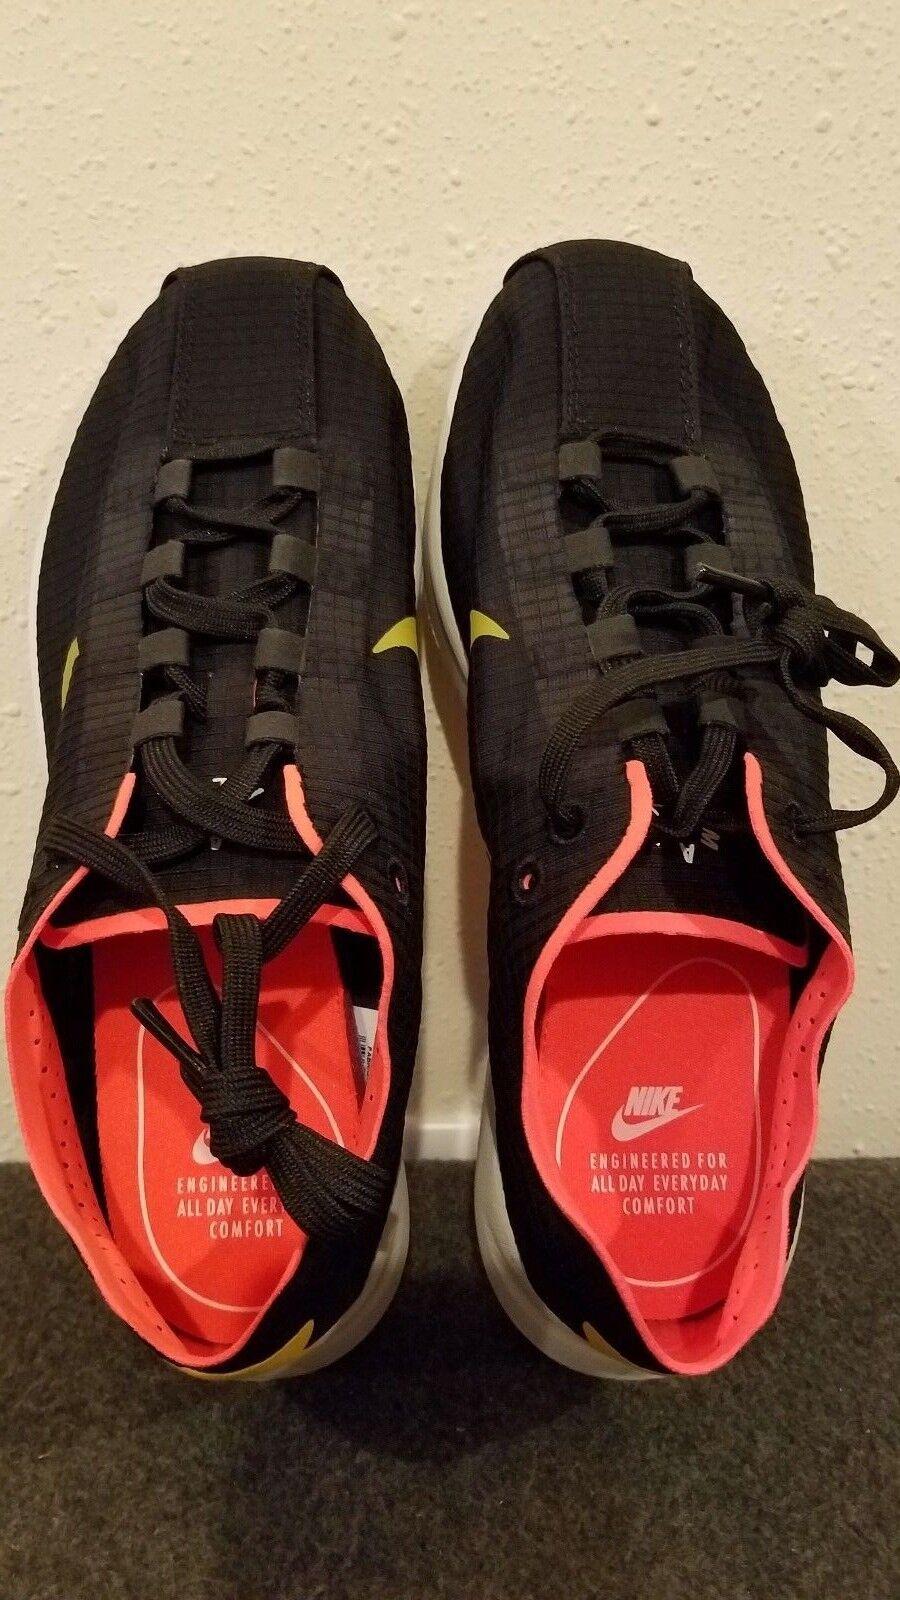 new style ecaa5 92538 ... Nike Women s Mayfly Lite SI Size Size Size 9 881196 001 Black Gold Dart  Total ...